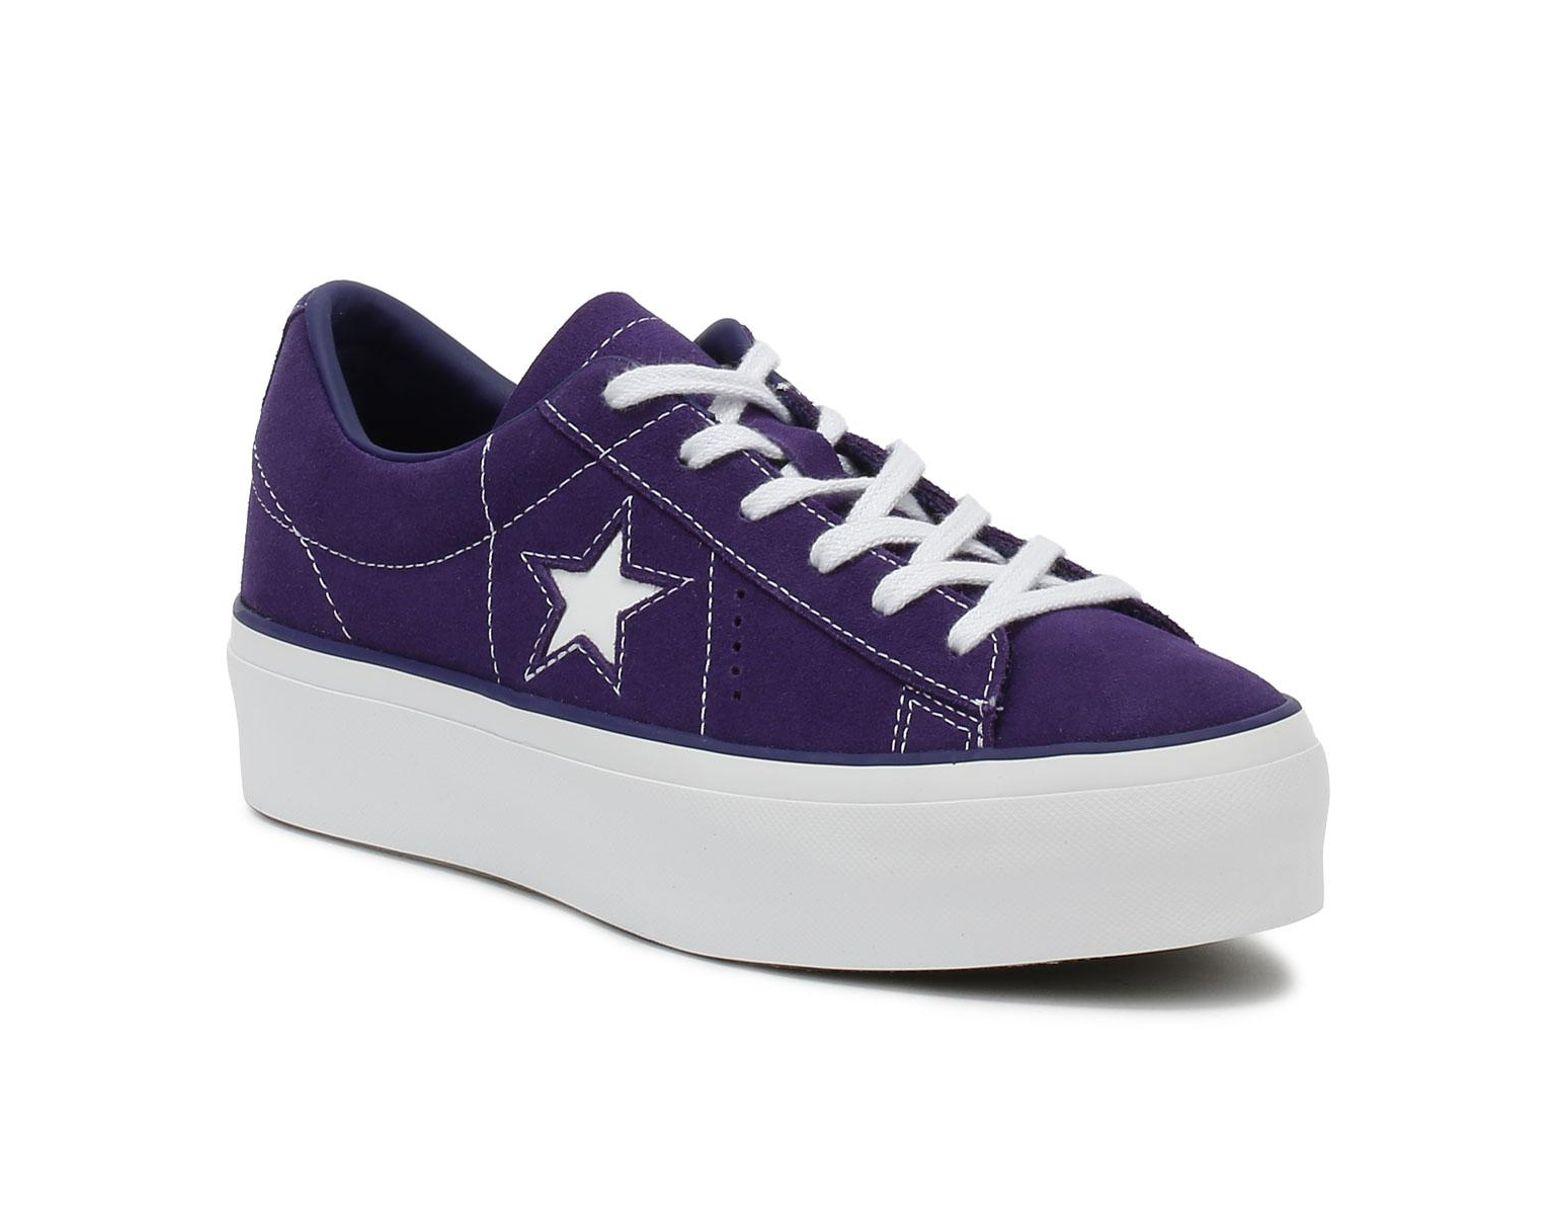 converse platform one star